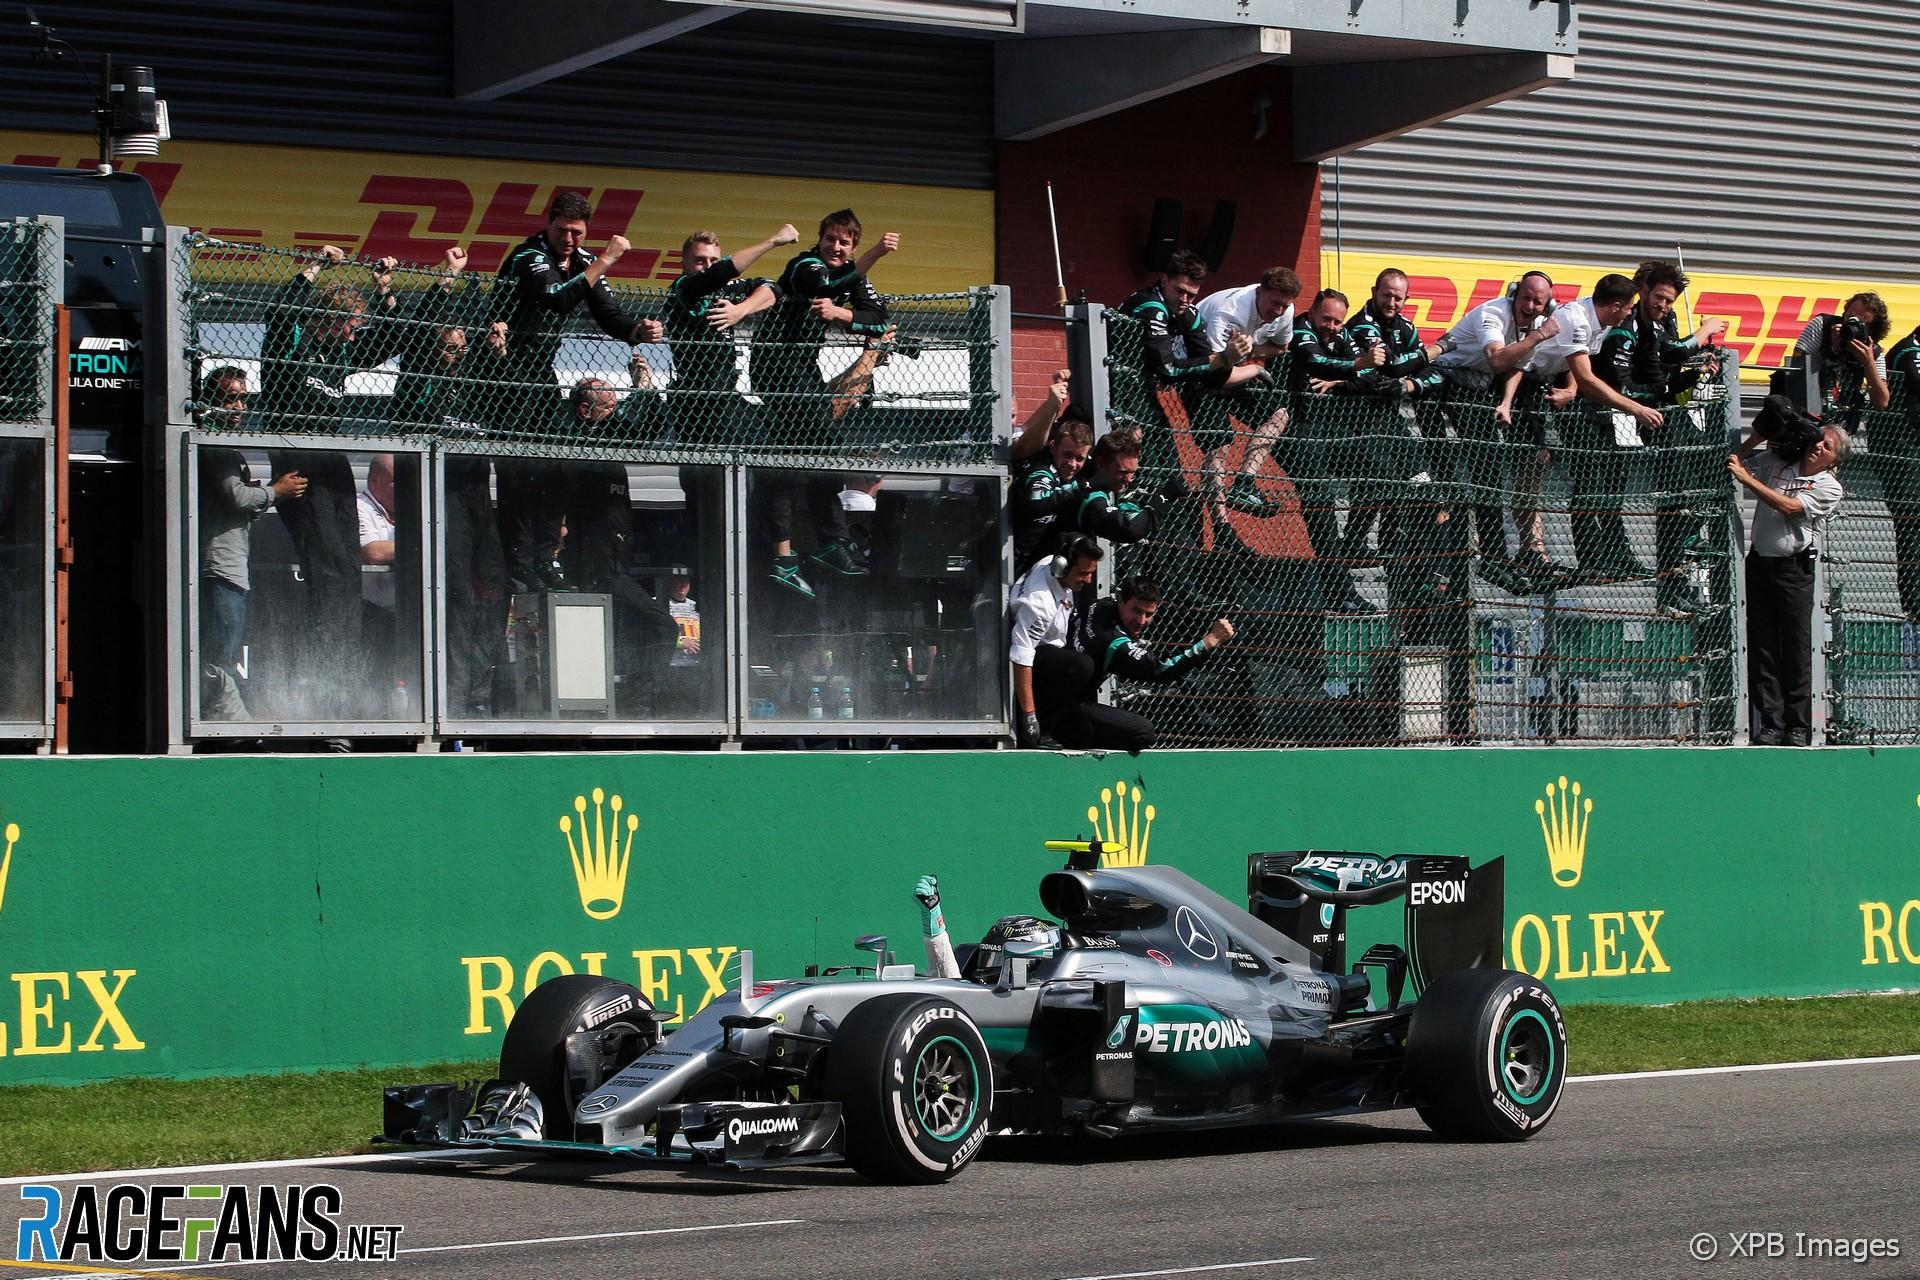 Nico Rosberg, Mercedes, Spa-Francorchamps, 2016